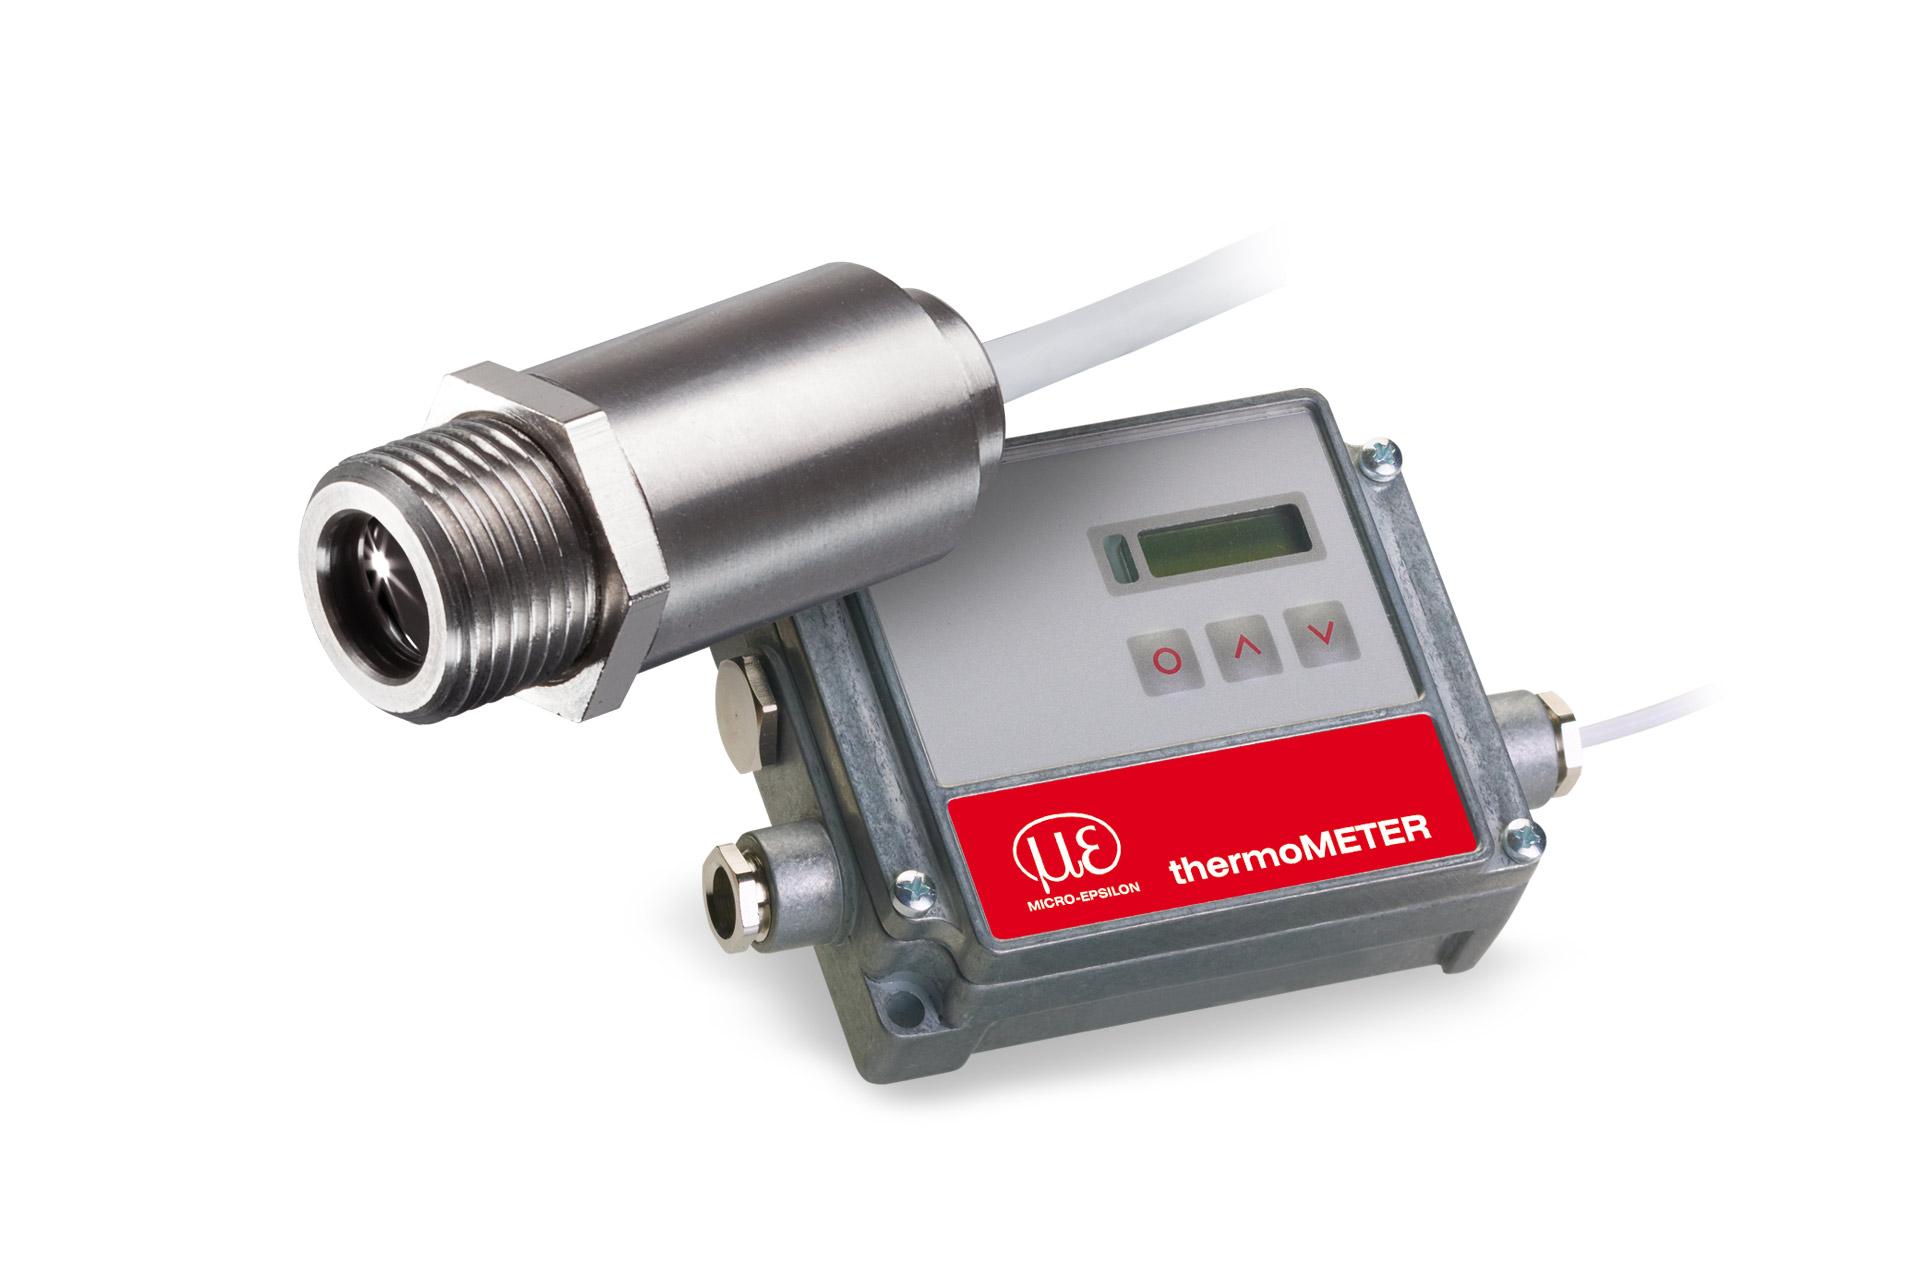 Miniatur-Pyrometer CT-SF15-C1